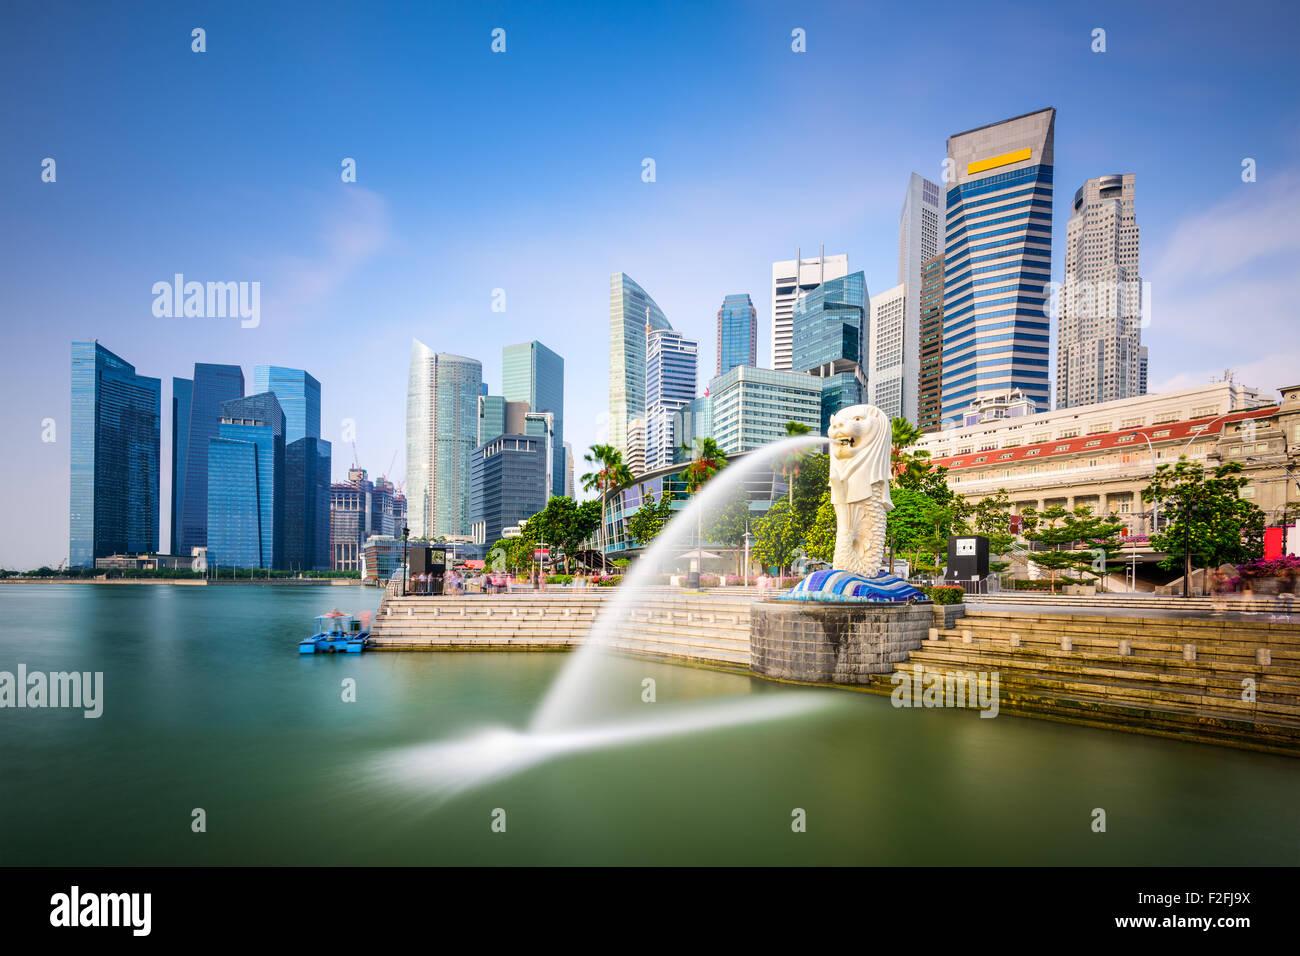 Singapur skyline en el Merlion fuente. Imagen De Stock